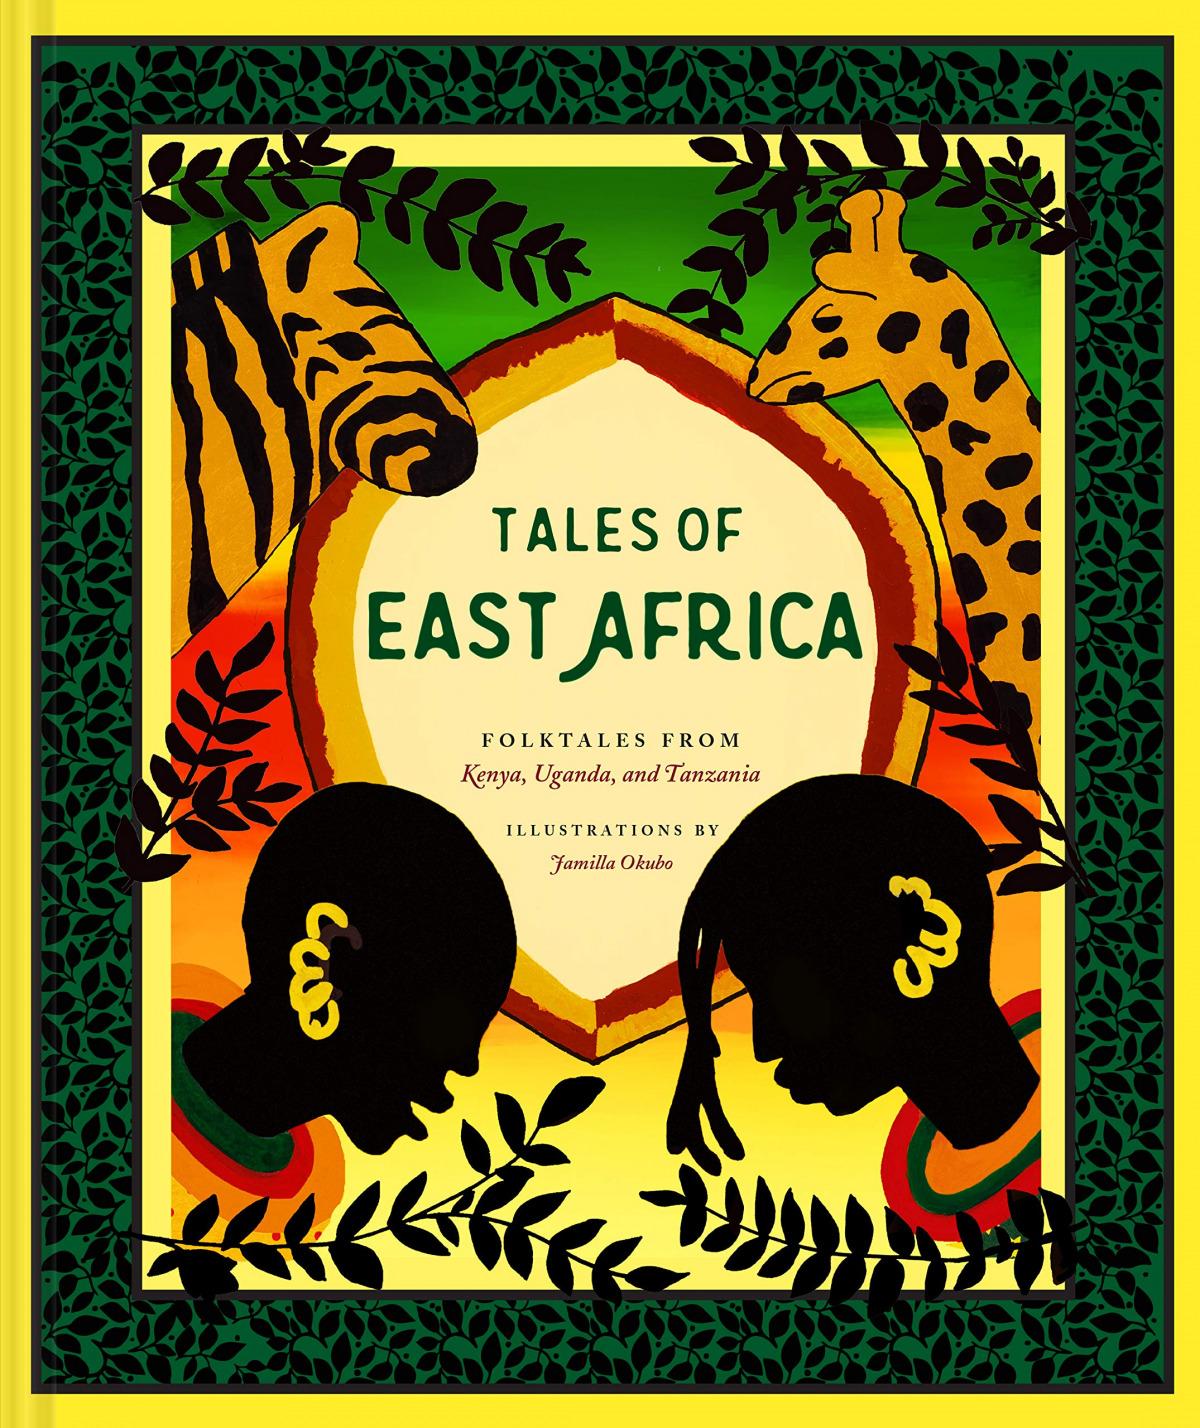 Tales of East Africa - Folktales from Kenya, Uganda and Tanzania